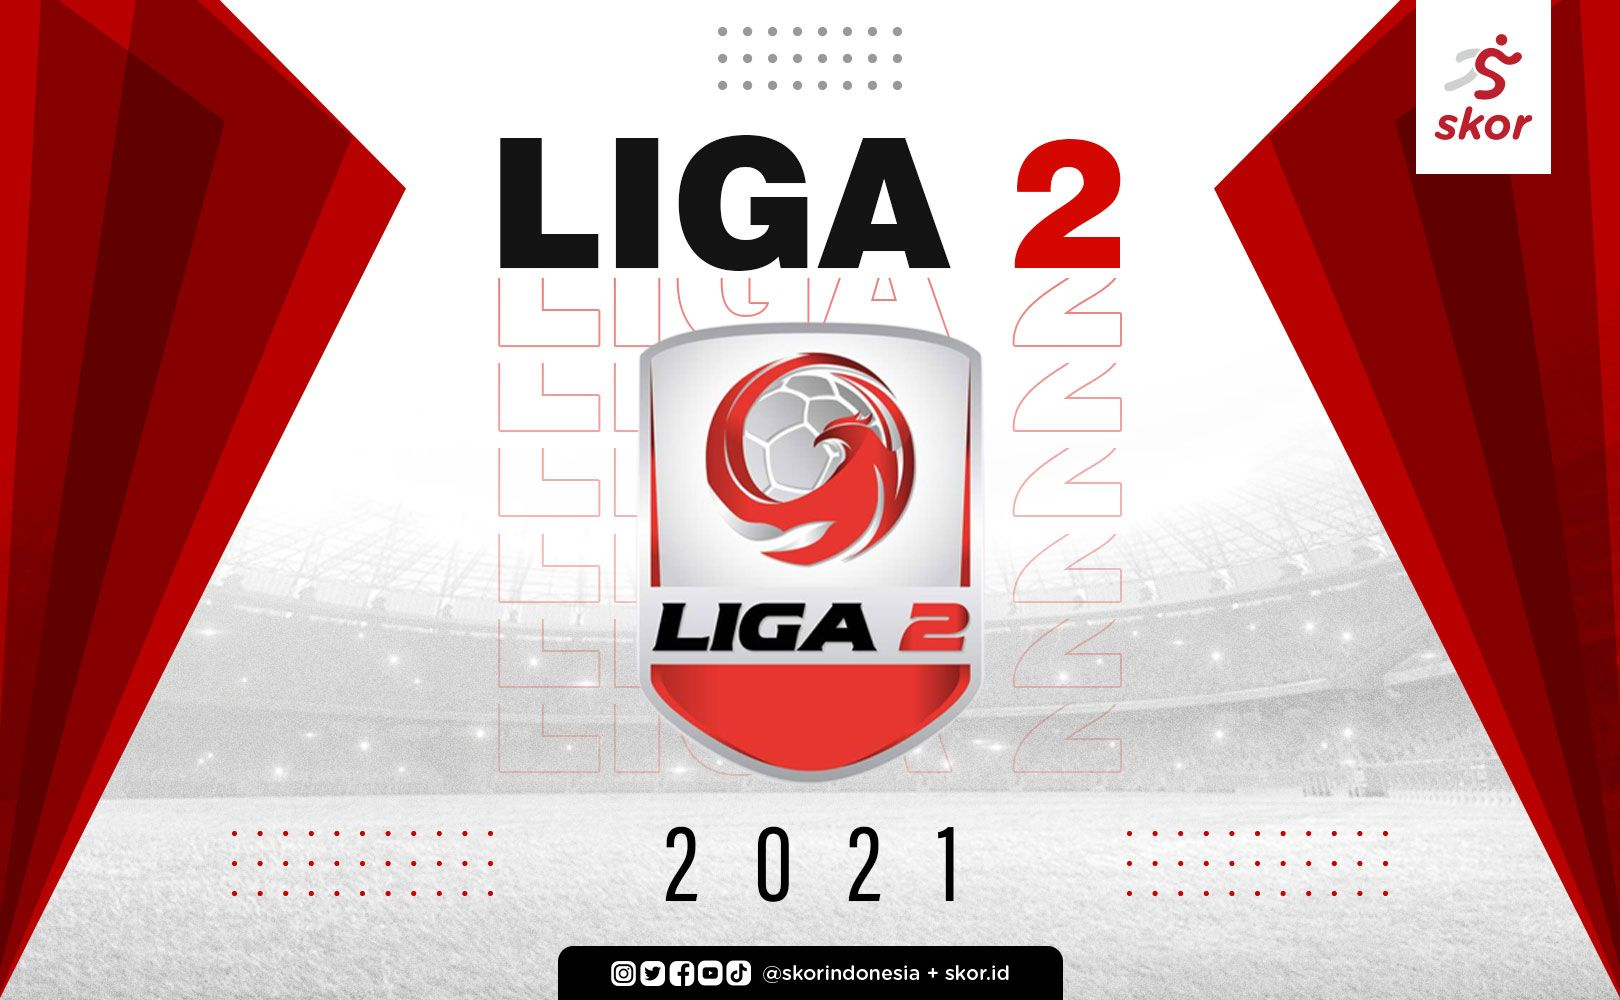 PREDIKSI PEKAN KEDUA GRUP B LIGA 2 2021: UJIAN RANS CILEGON FC, DEWA UNITED BERAT